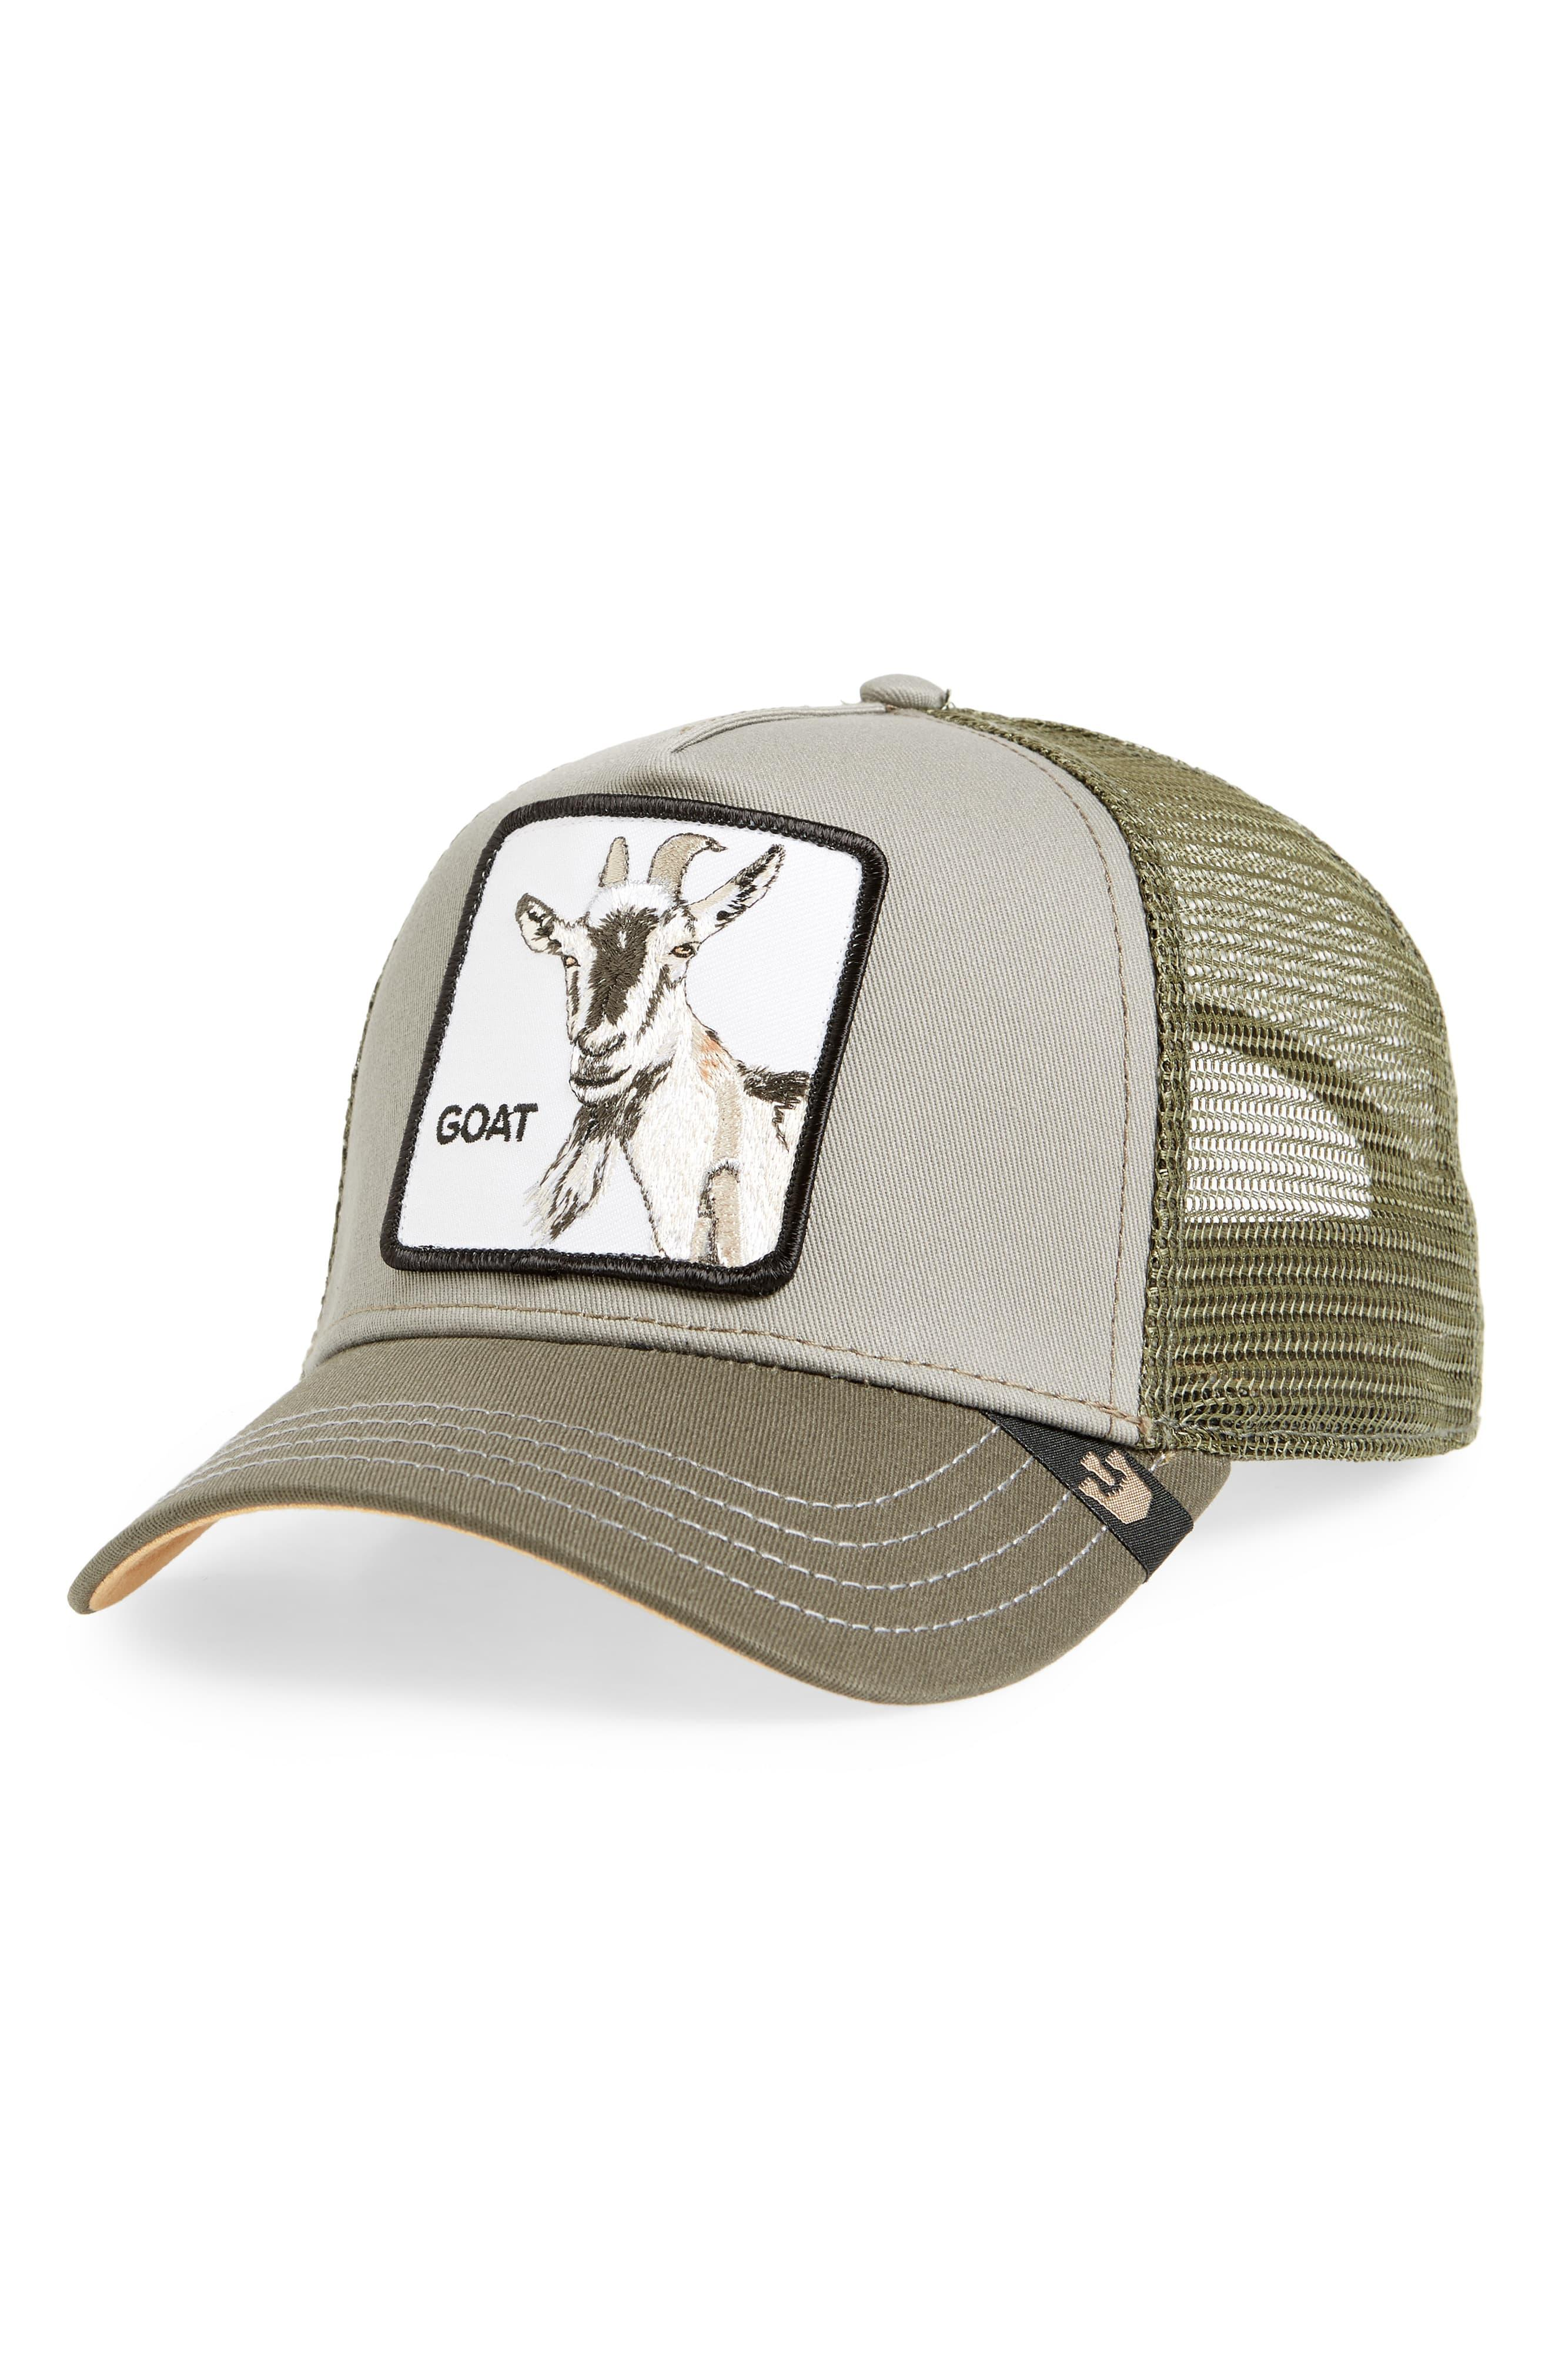 a0be686f Goorin Bros Goat Beard Trucker Hat - for Men - Lyst